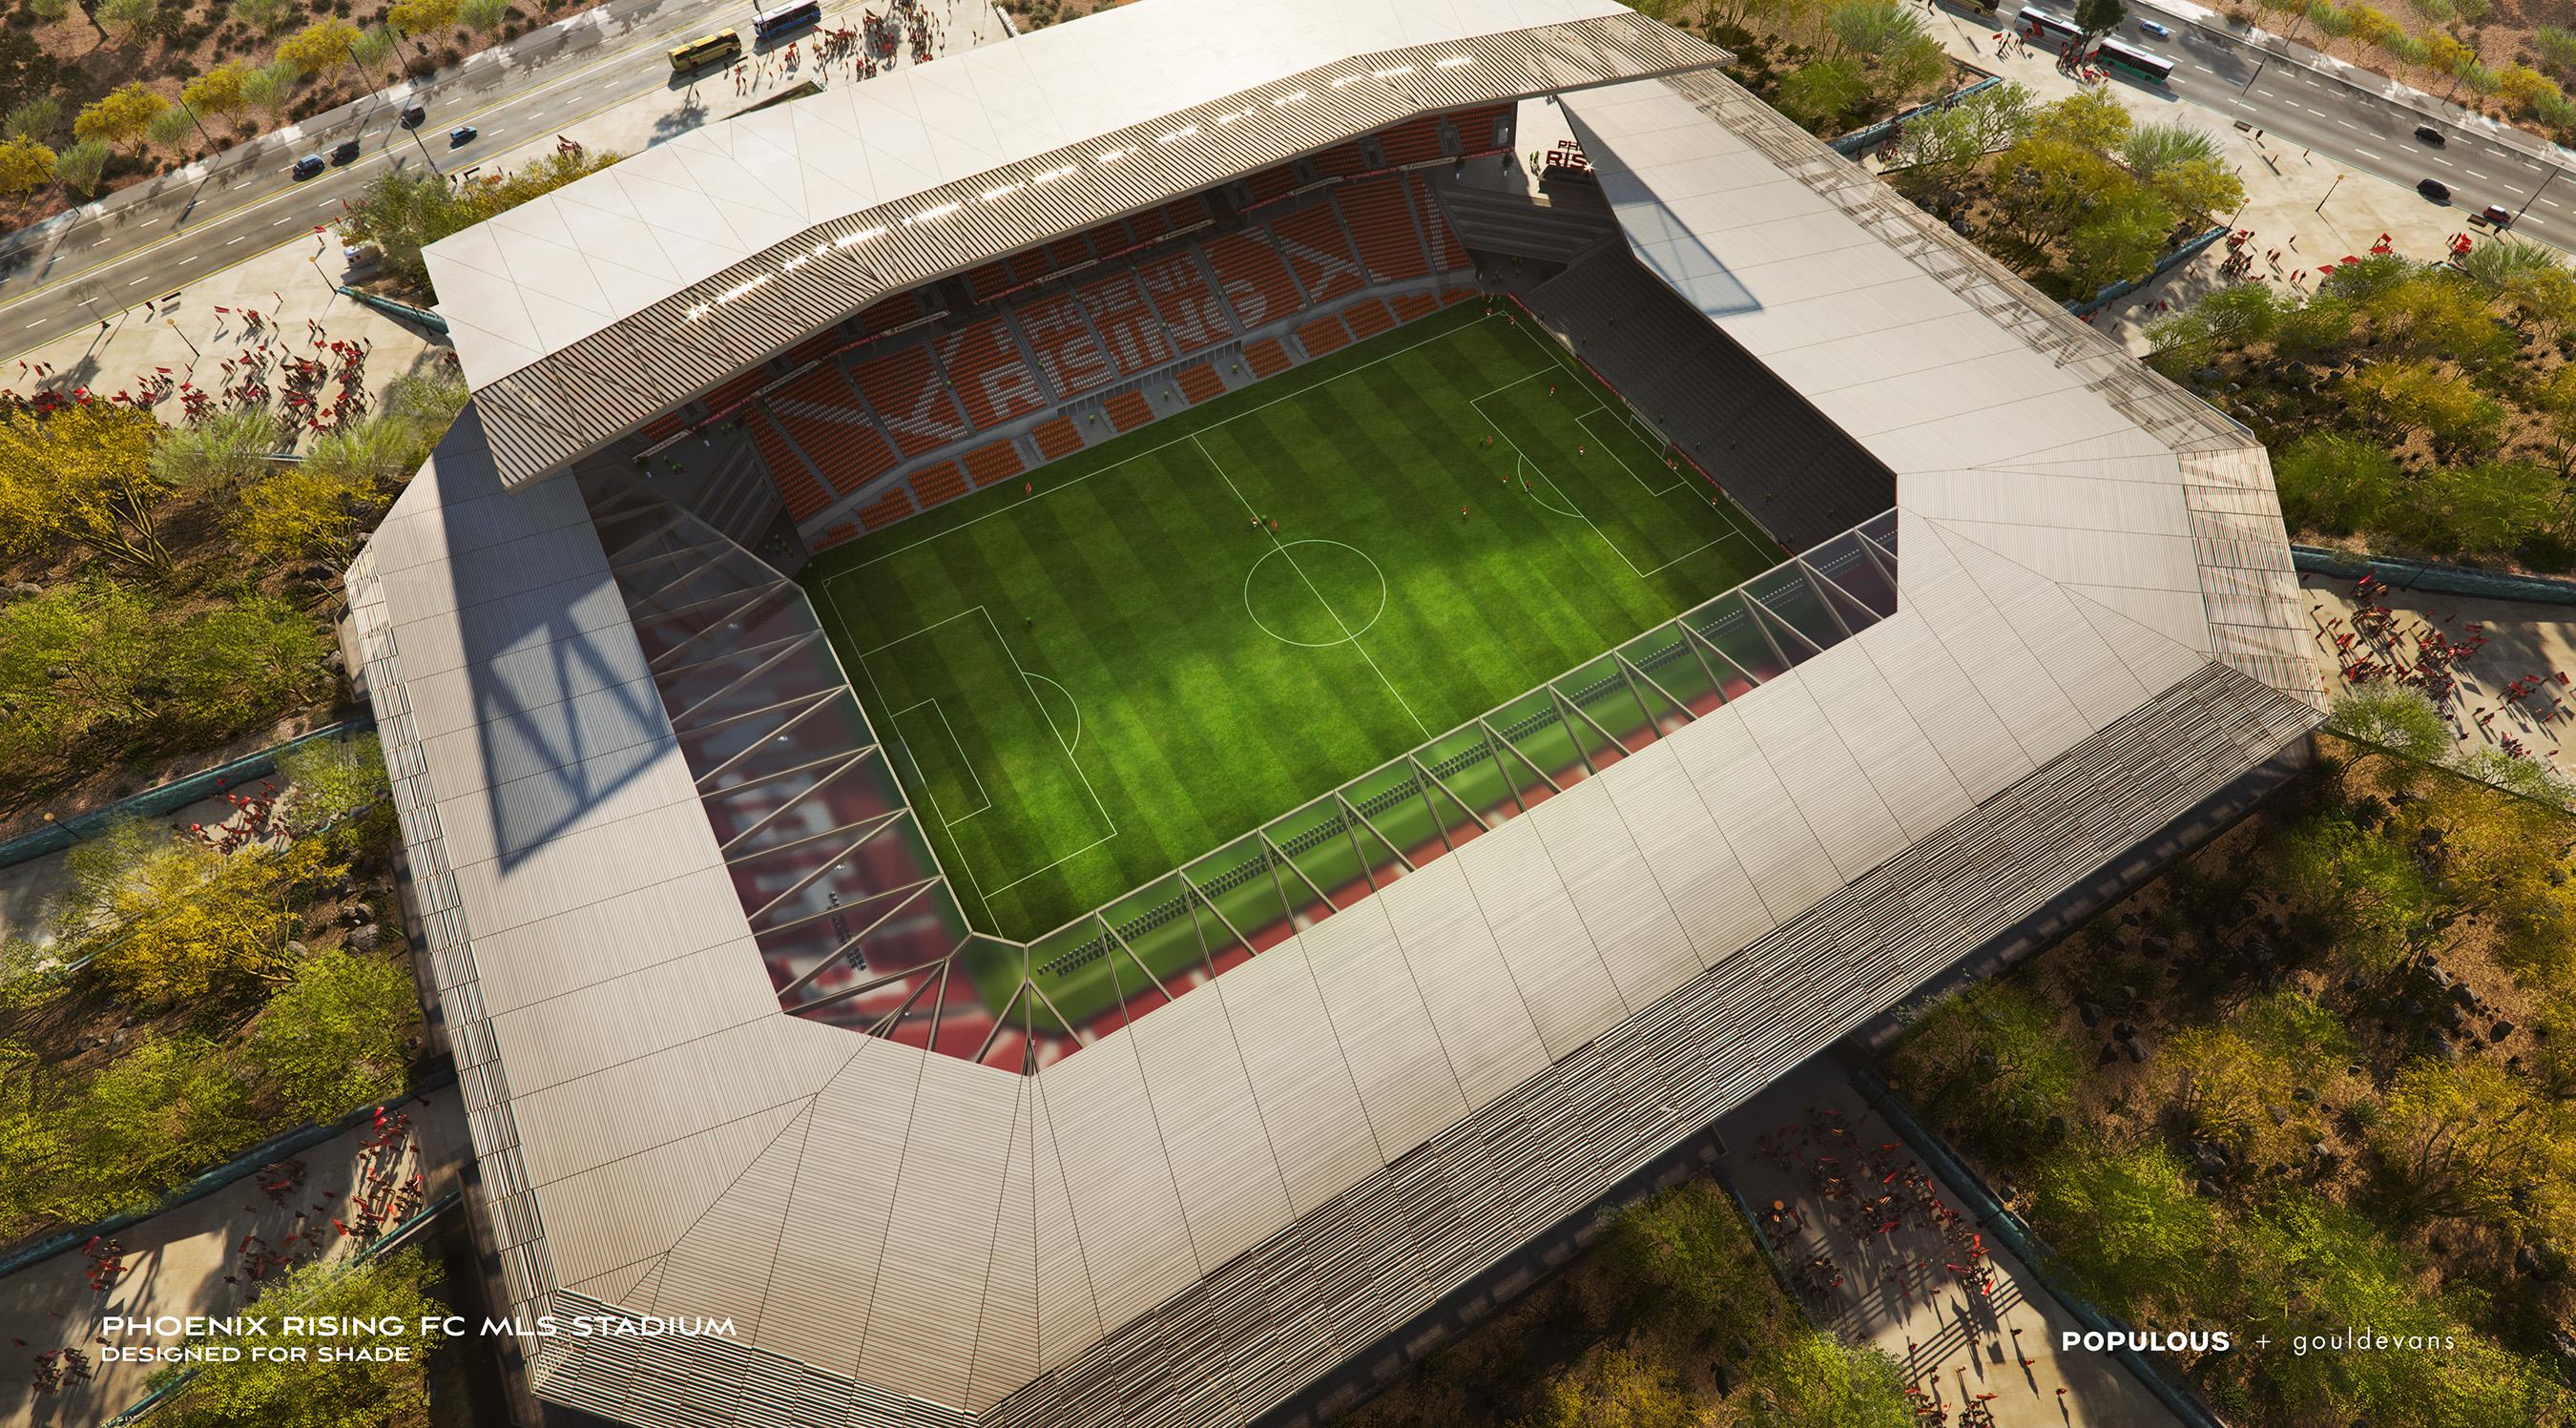 Phoenix Rising Football Club Offers Sneak Peak of Proposed